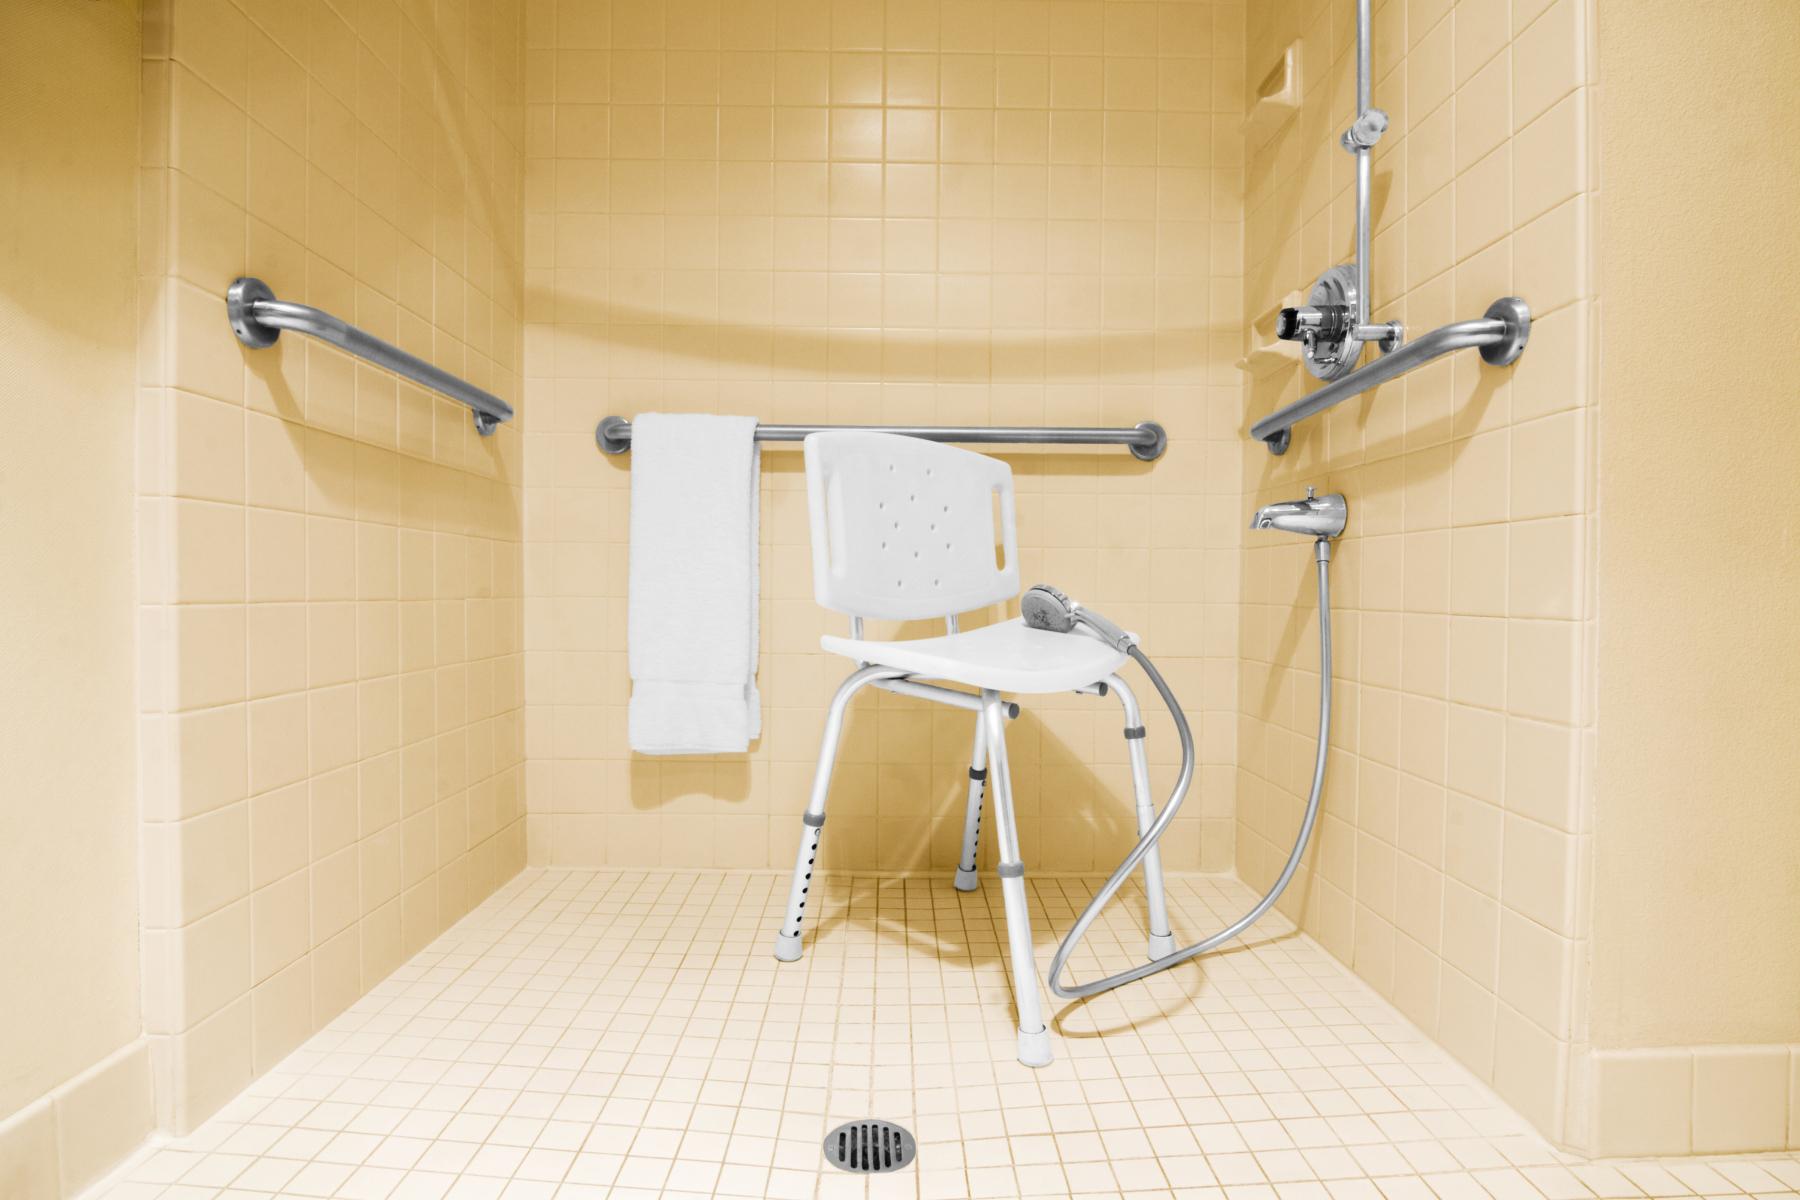 Dement glomdes pa toalett